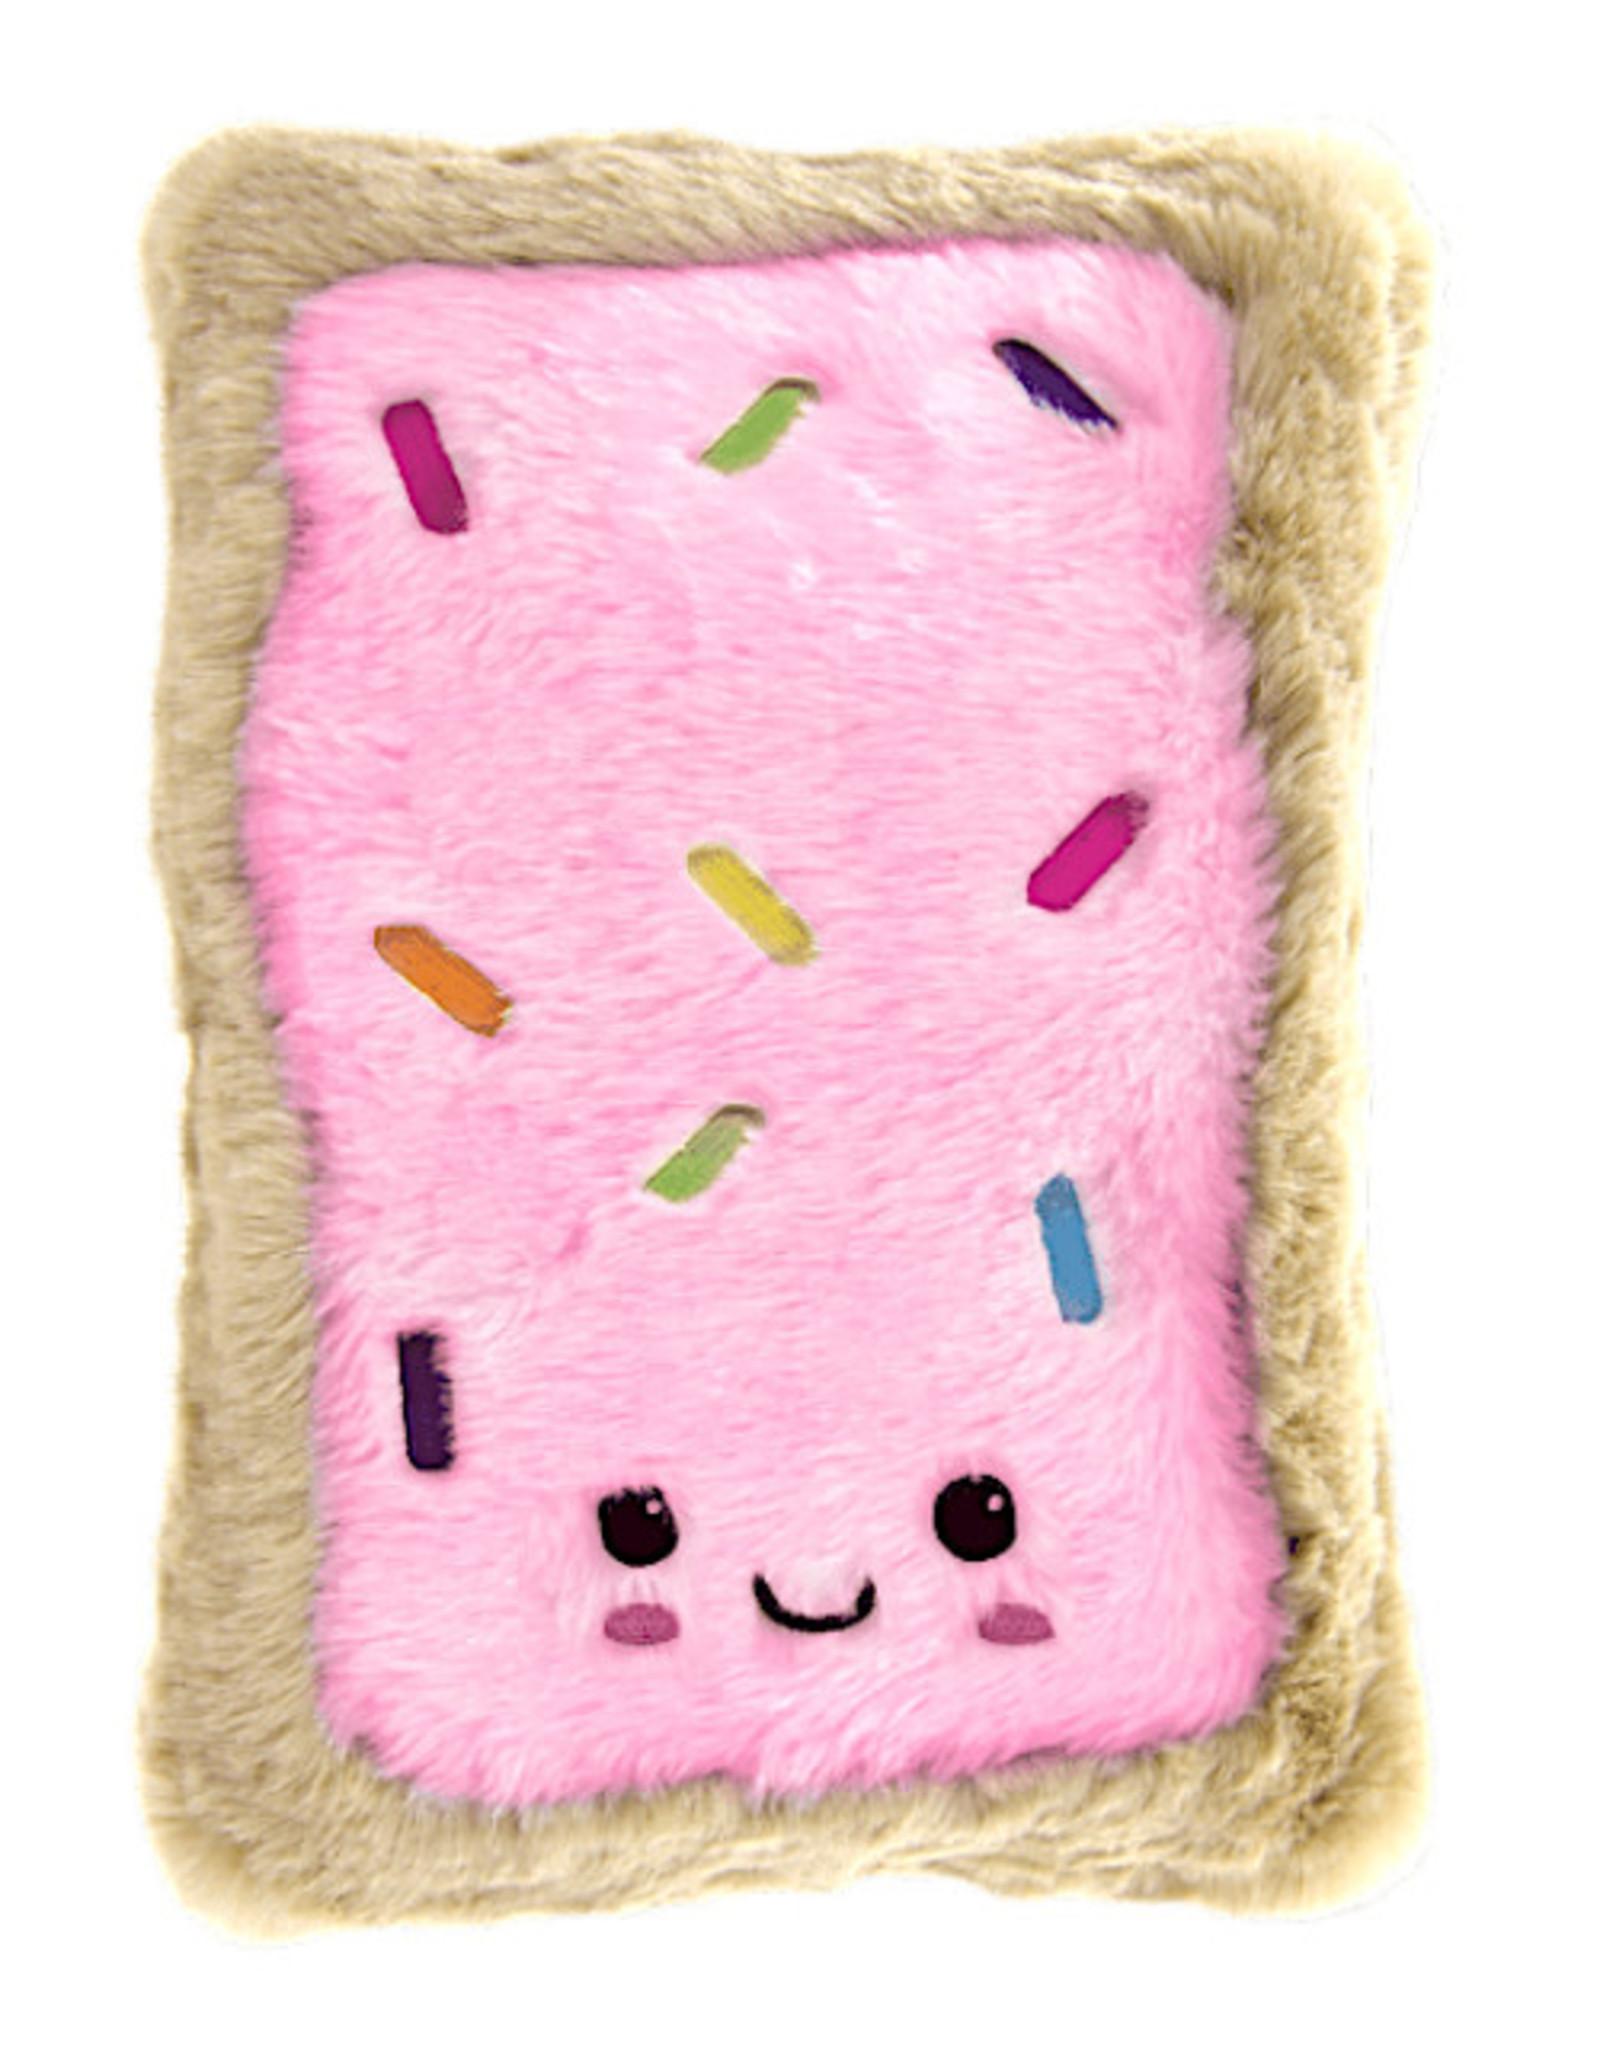 Iscream Toaster Cake